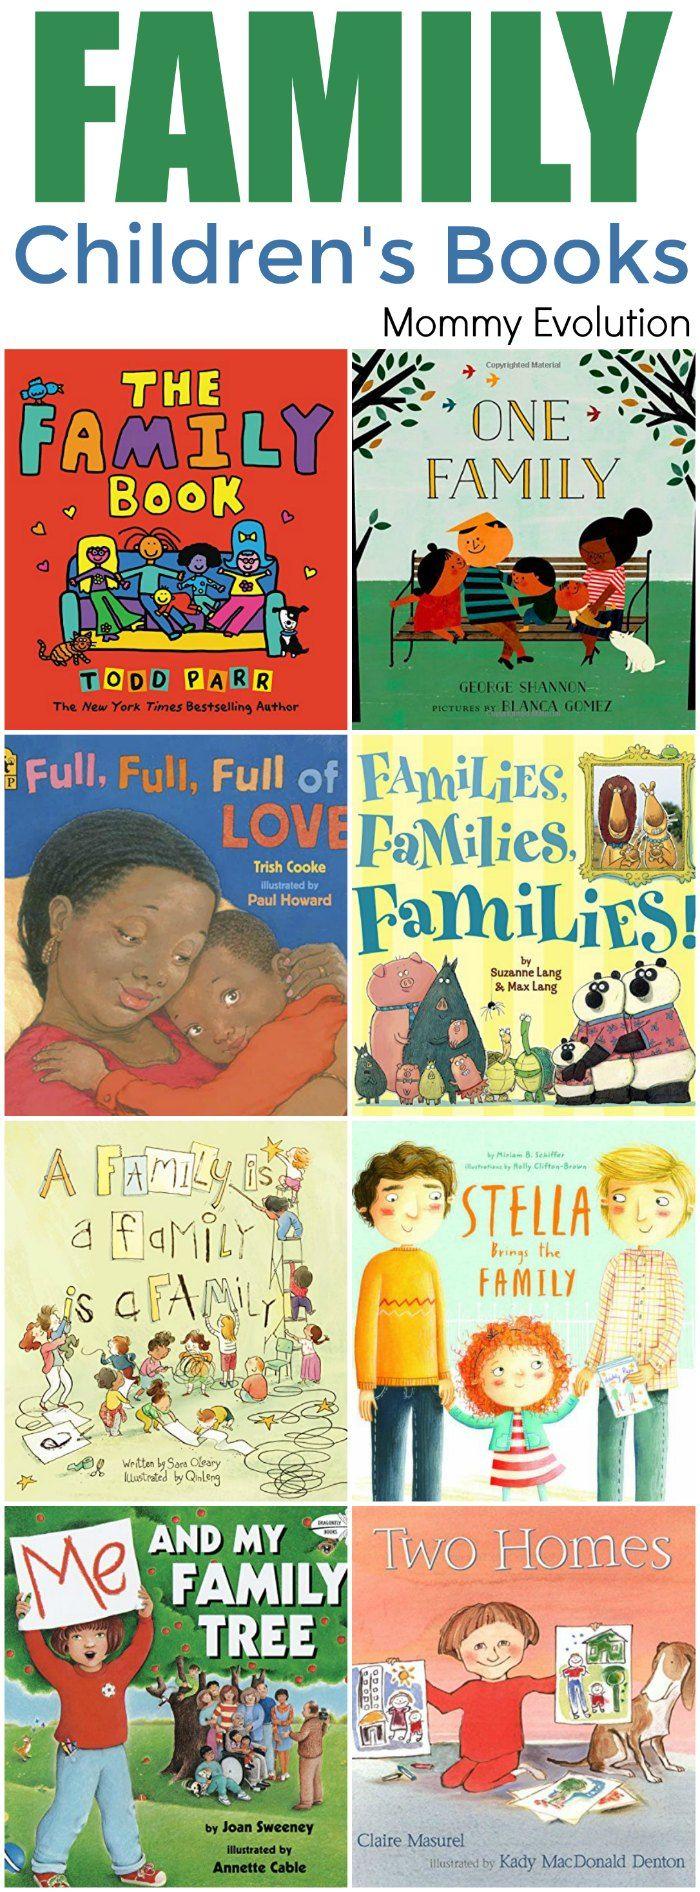 books preschool theme childrens families unit children toddler preschoolers evolution read diverse study mommy kindergarten activities diversity